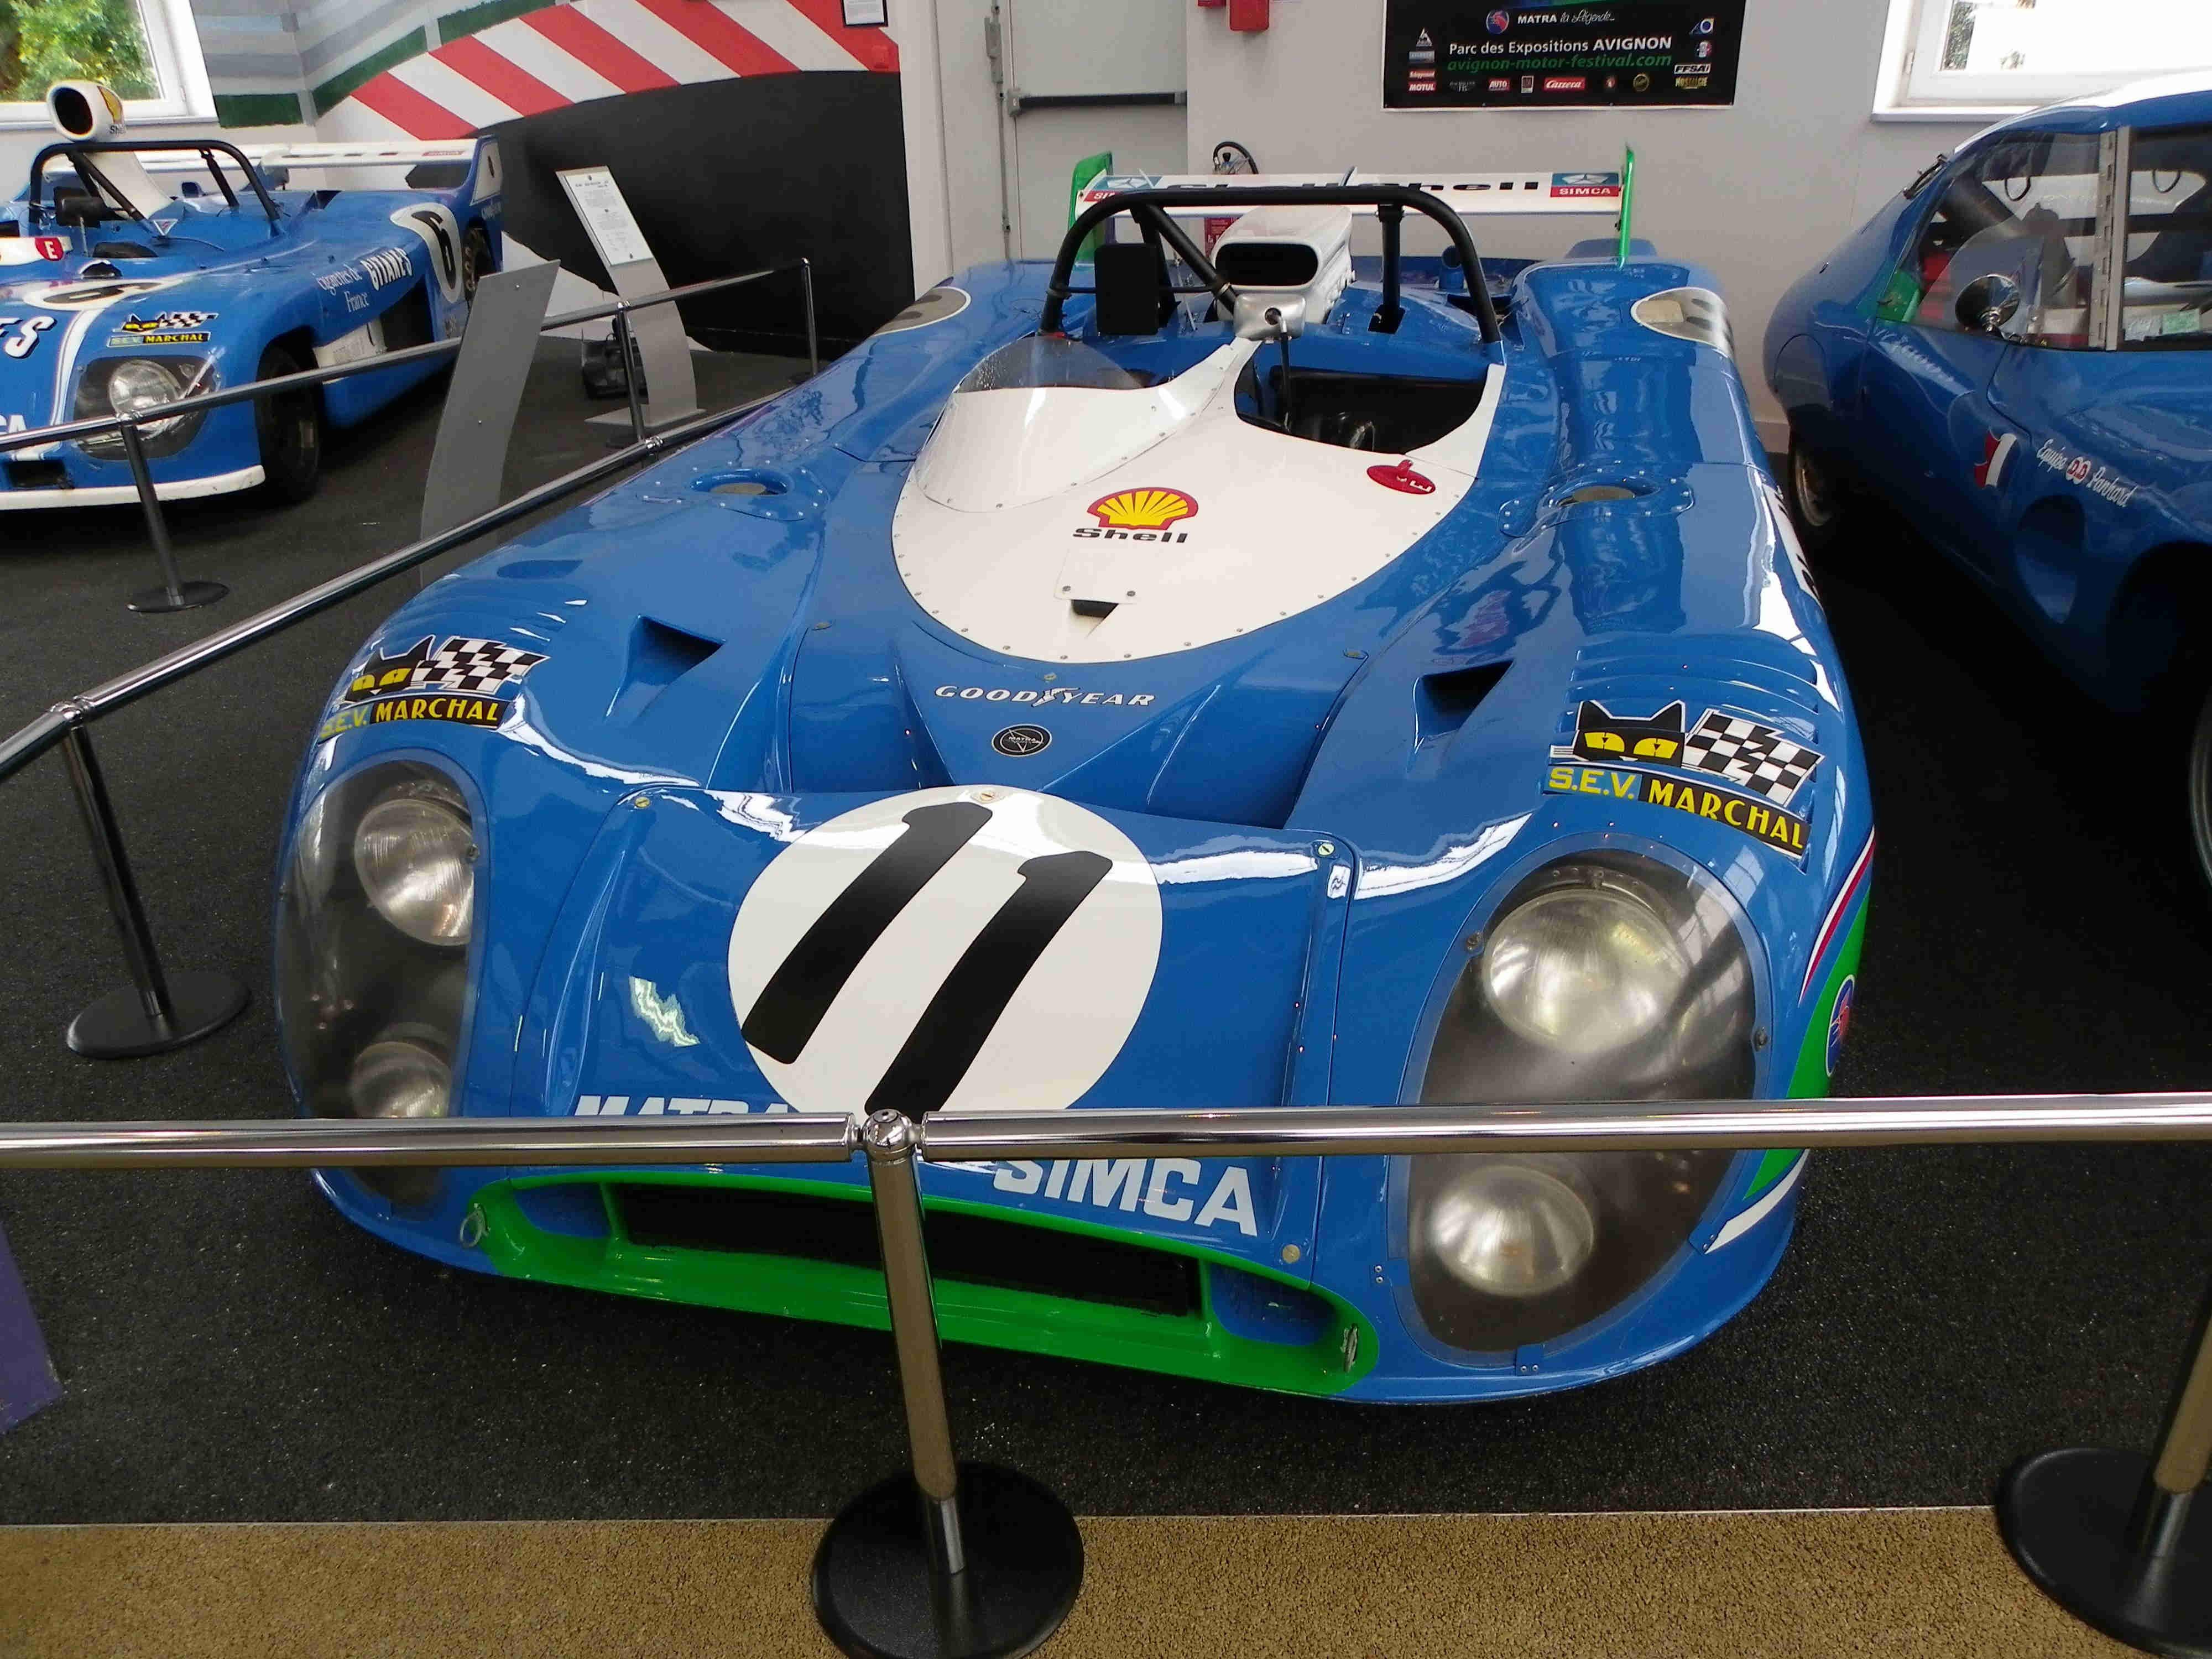 Mastra MS670 (24 heures du Mans 1972)